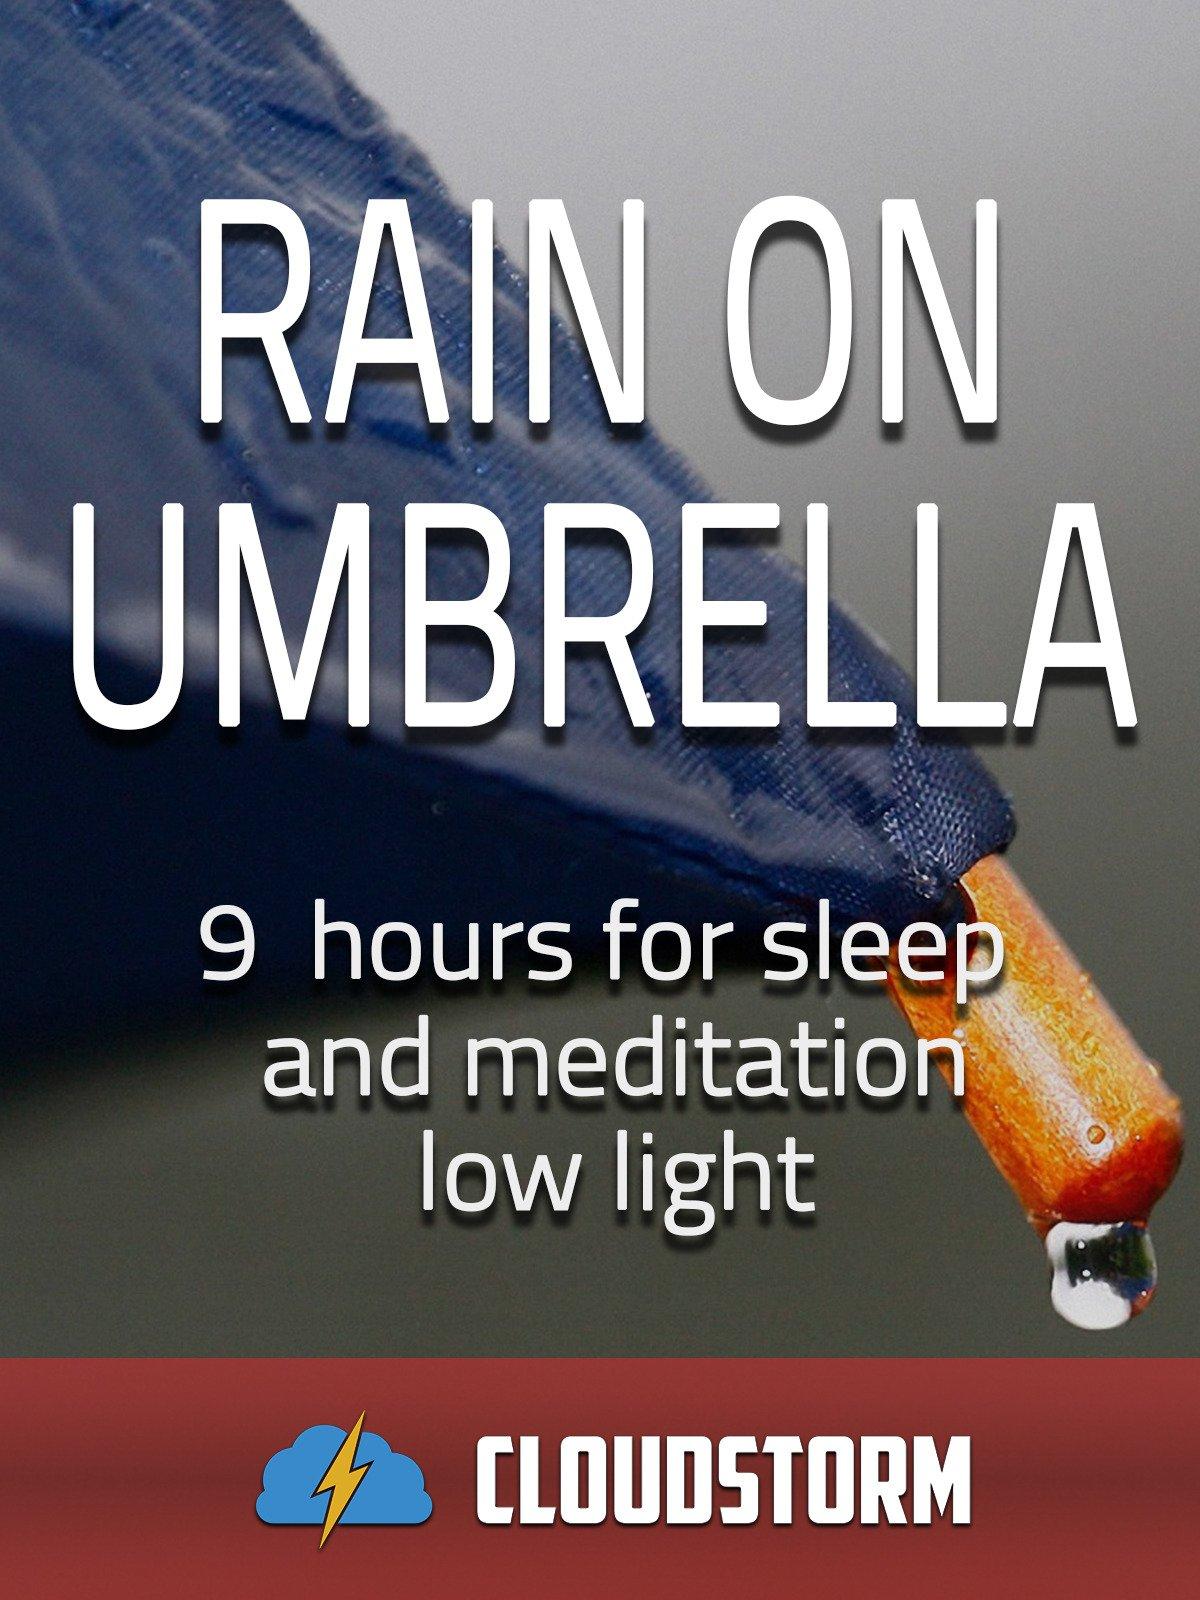 Rain on umbrella, 9 hours for Sleep and Meditation, low light